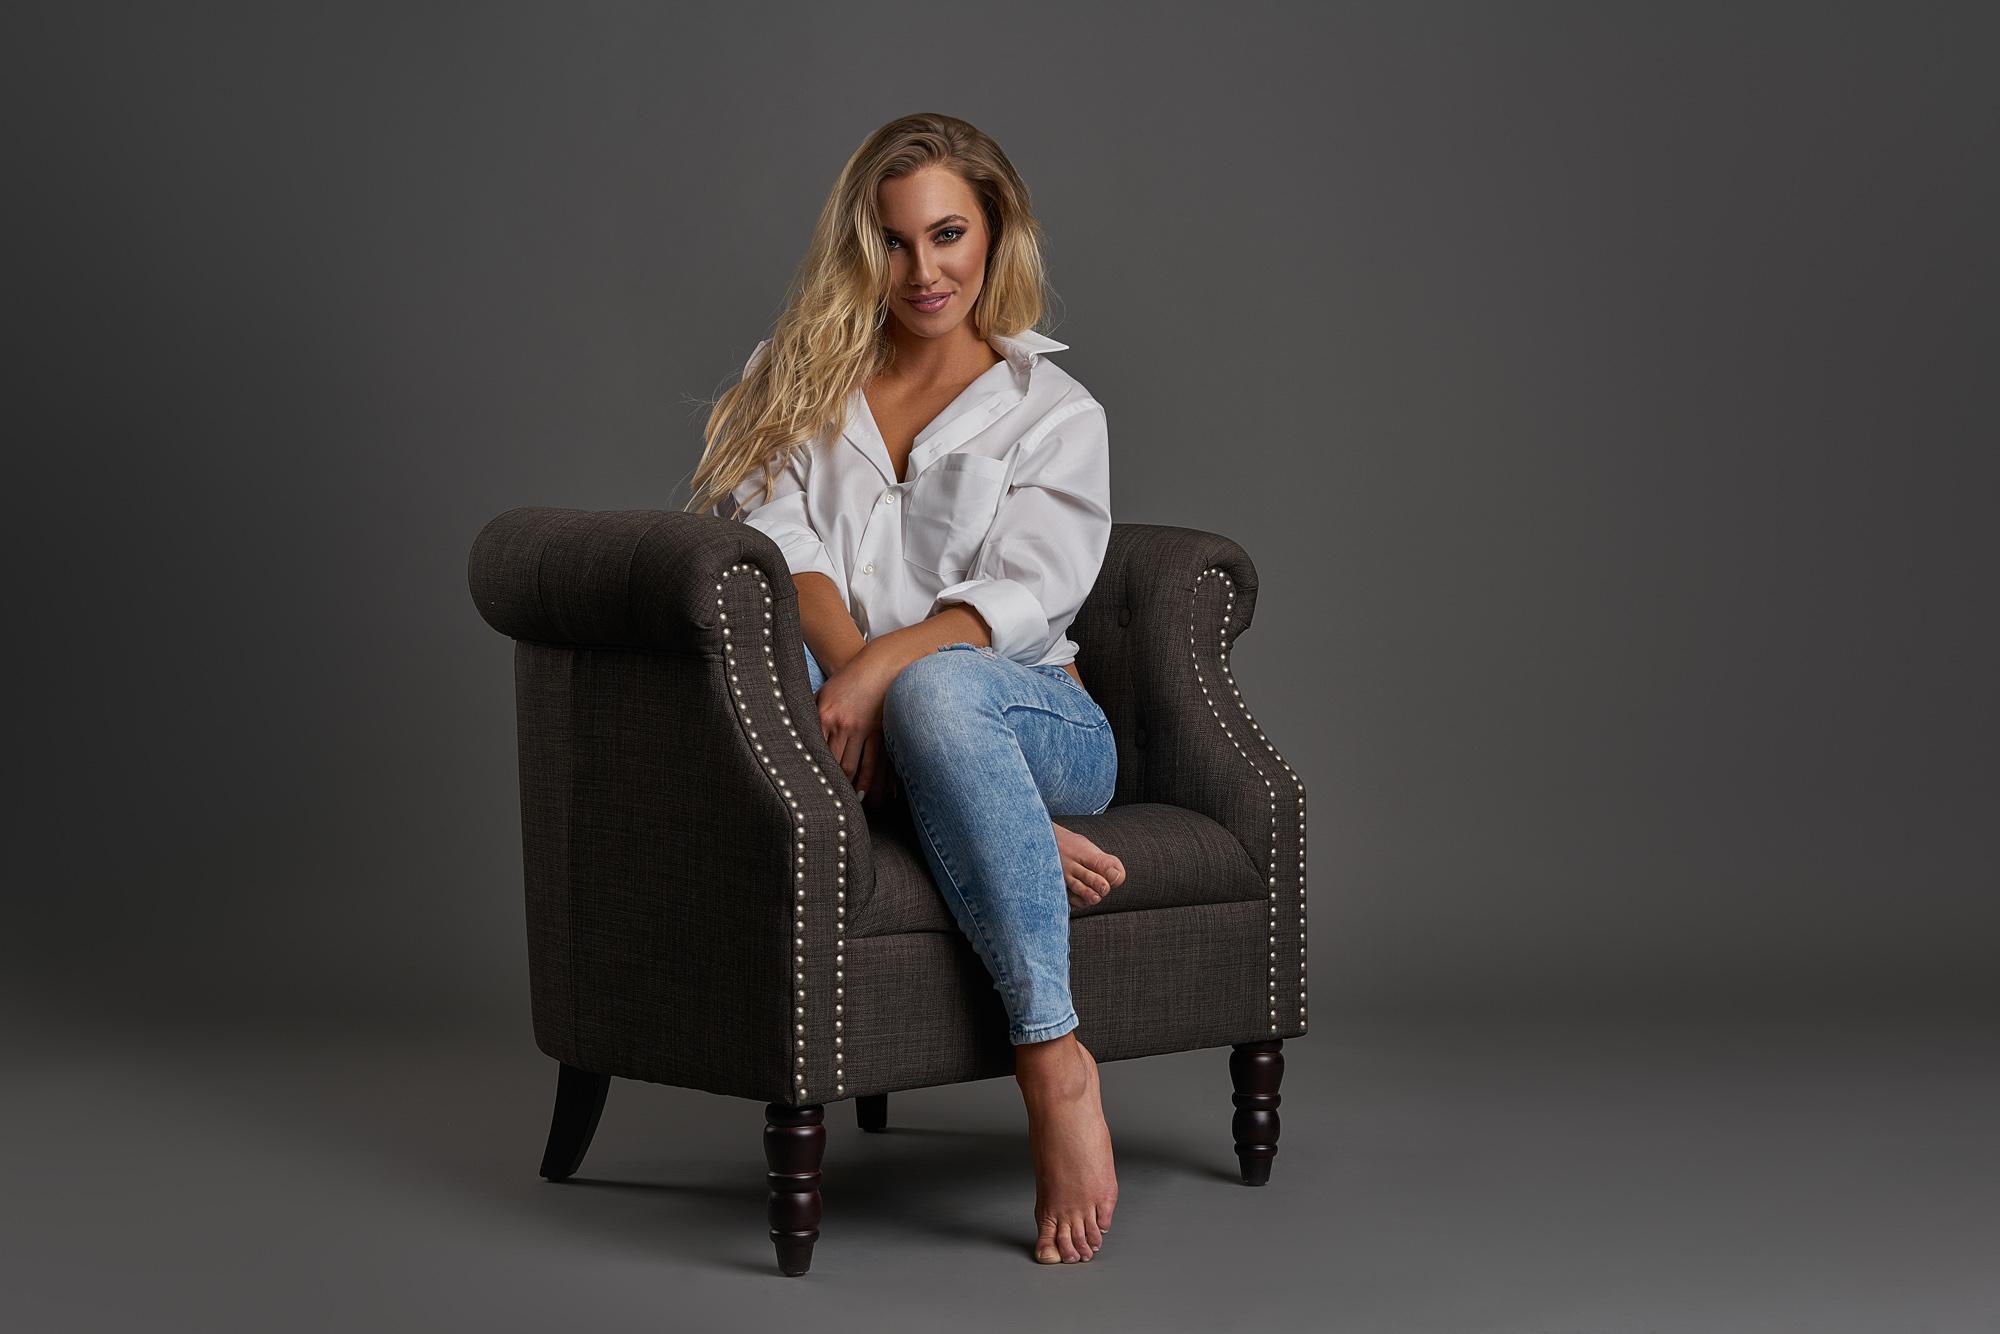 Lexi Fashion Model by Arizona Fashion Portrait Photographer Chad Weed